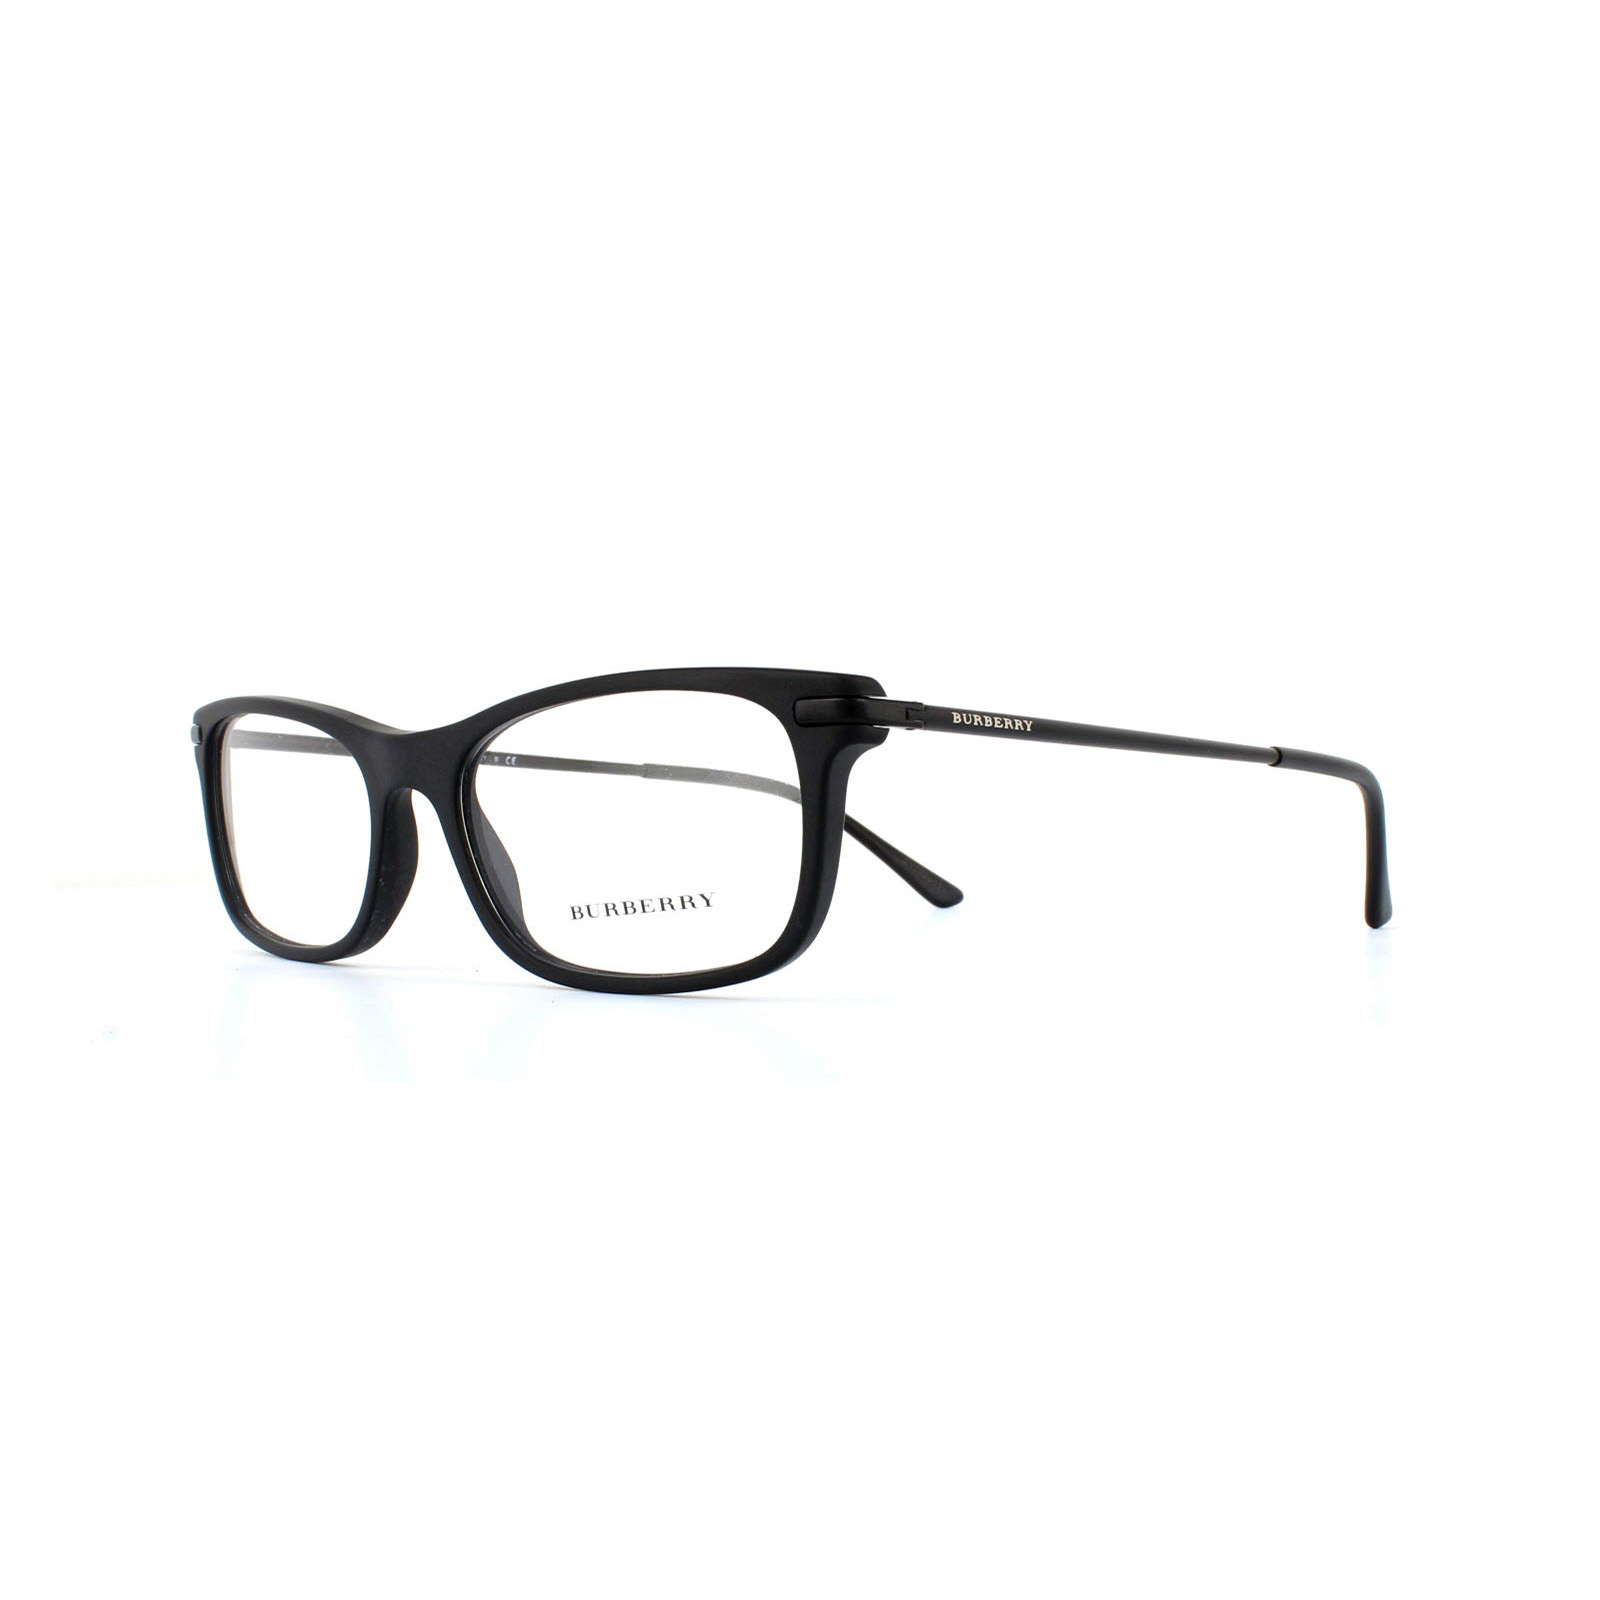 dba45ee5360f Sentinel Burberry Glasses Frames 2195 3464 Matte Black Womens 55mm